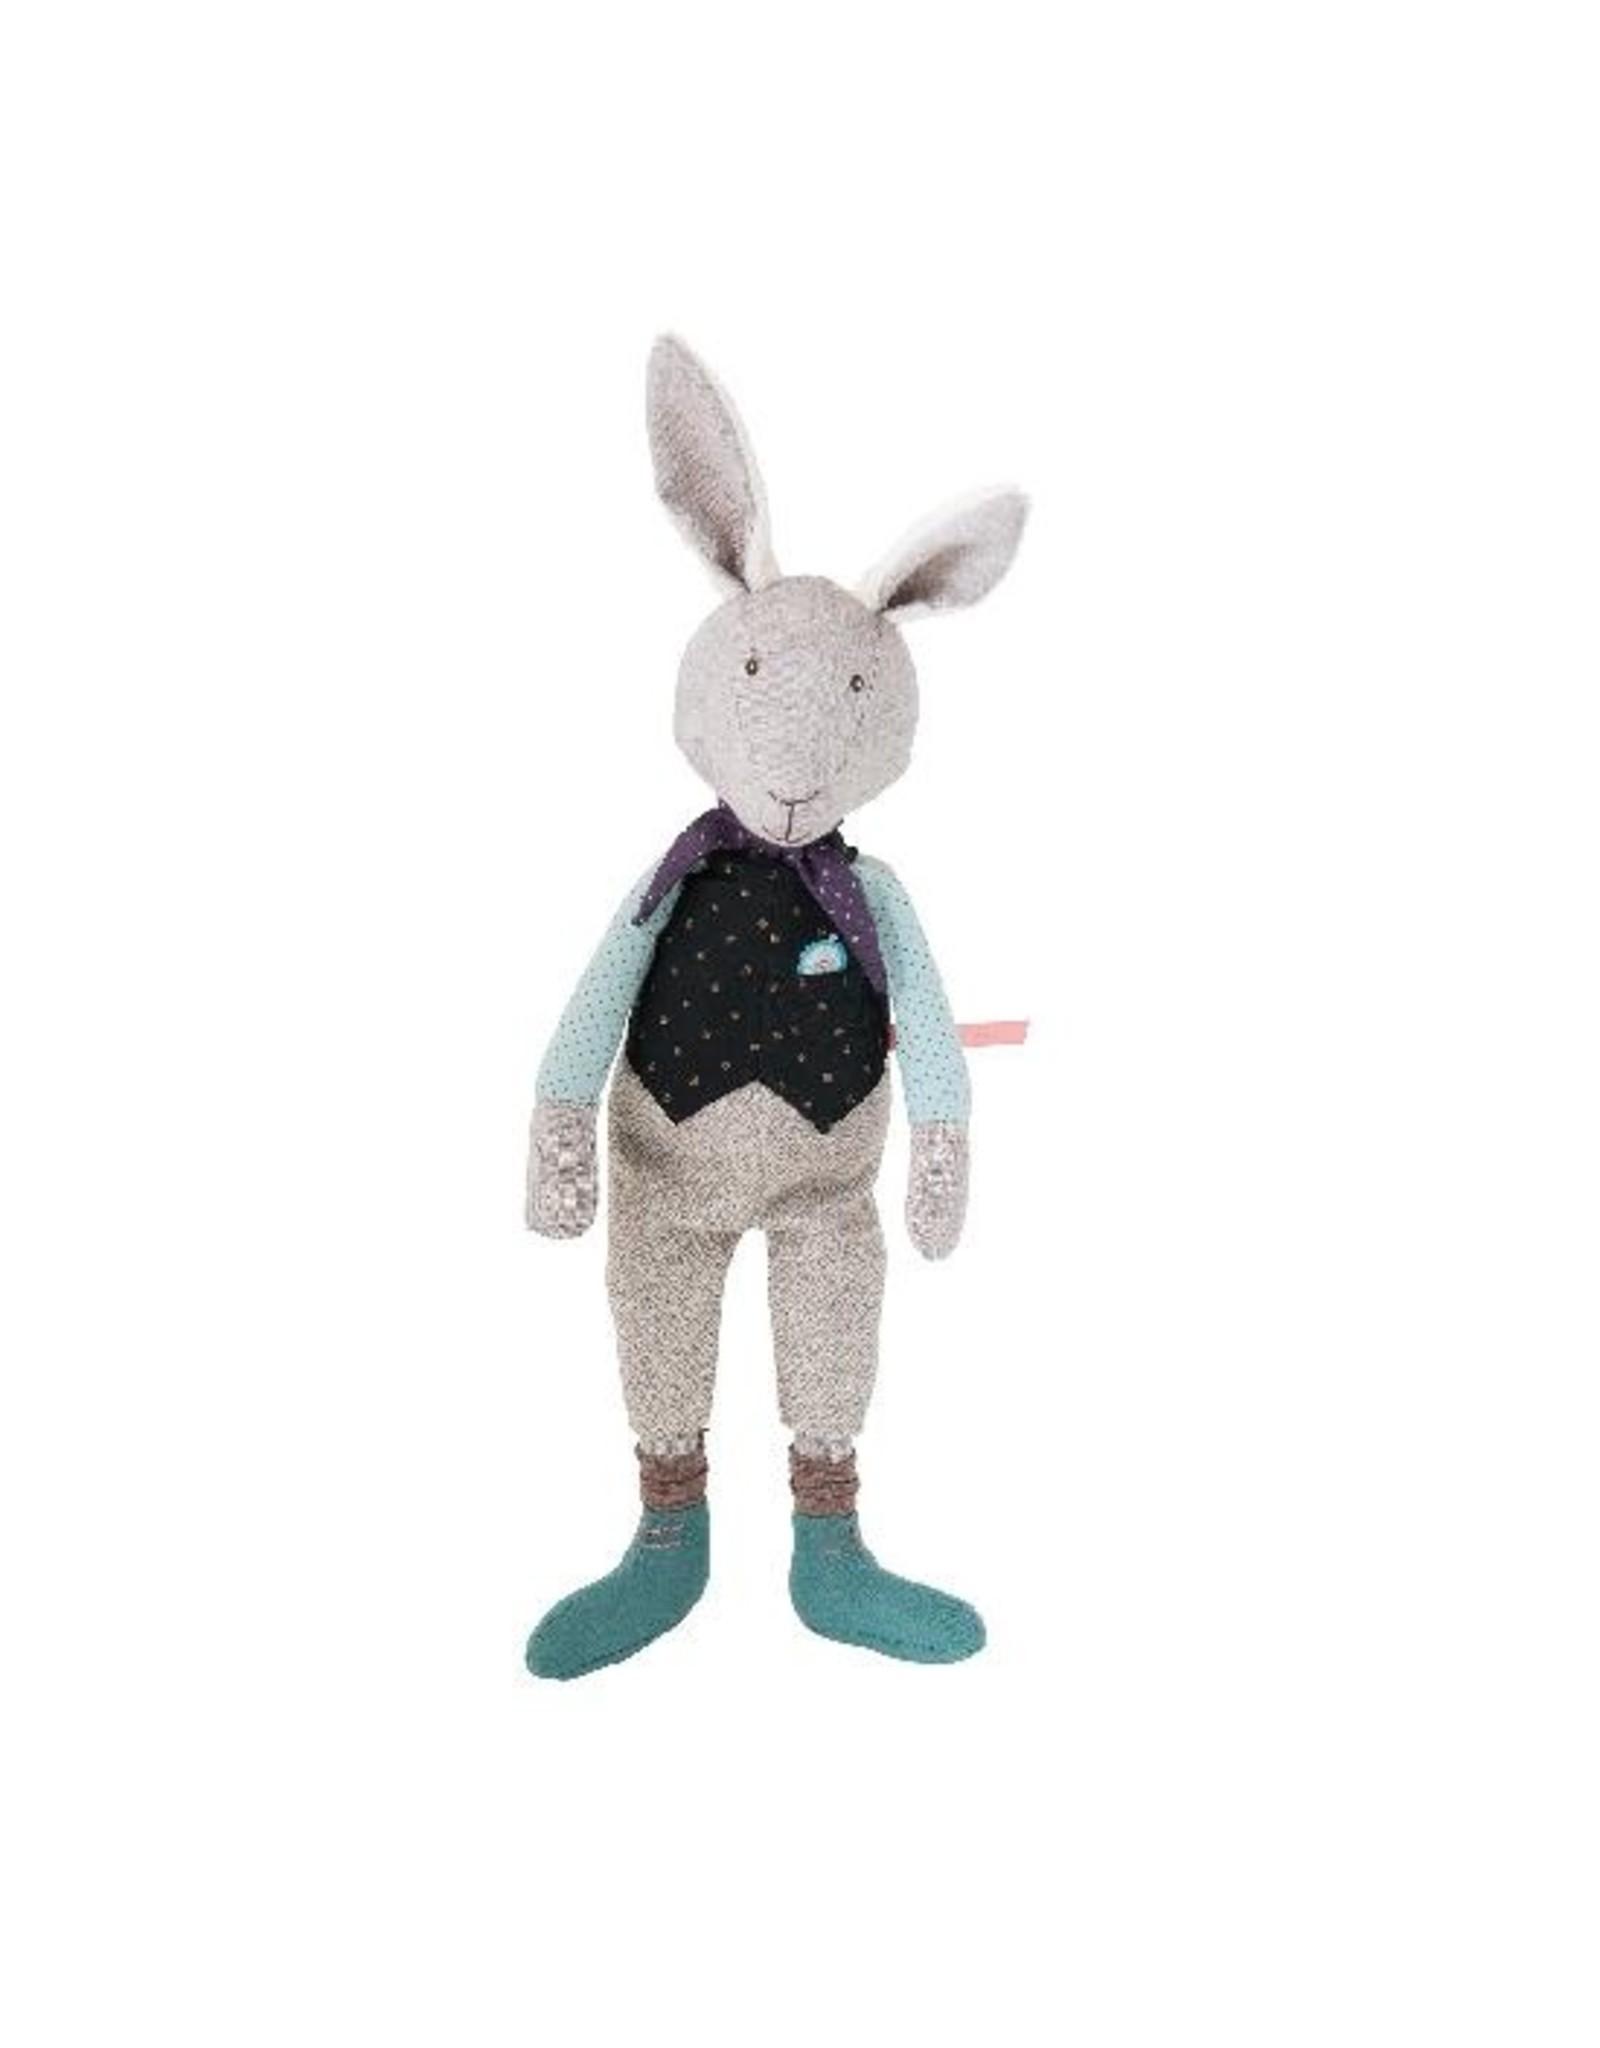 Moulin Roty Il Etait une Fois - forever late rabbit doll (37 cm)